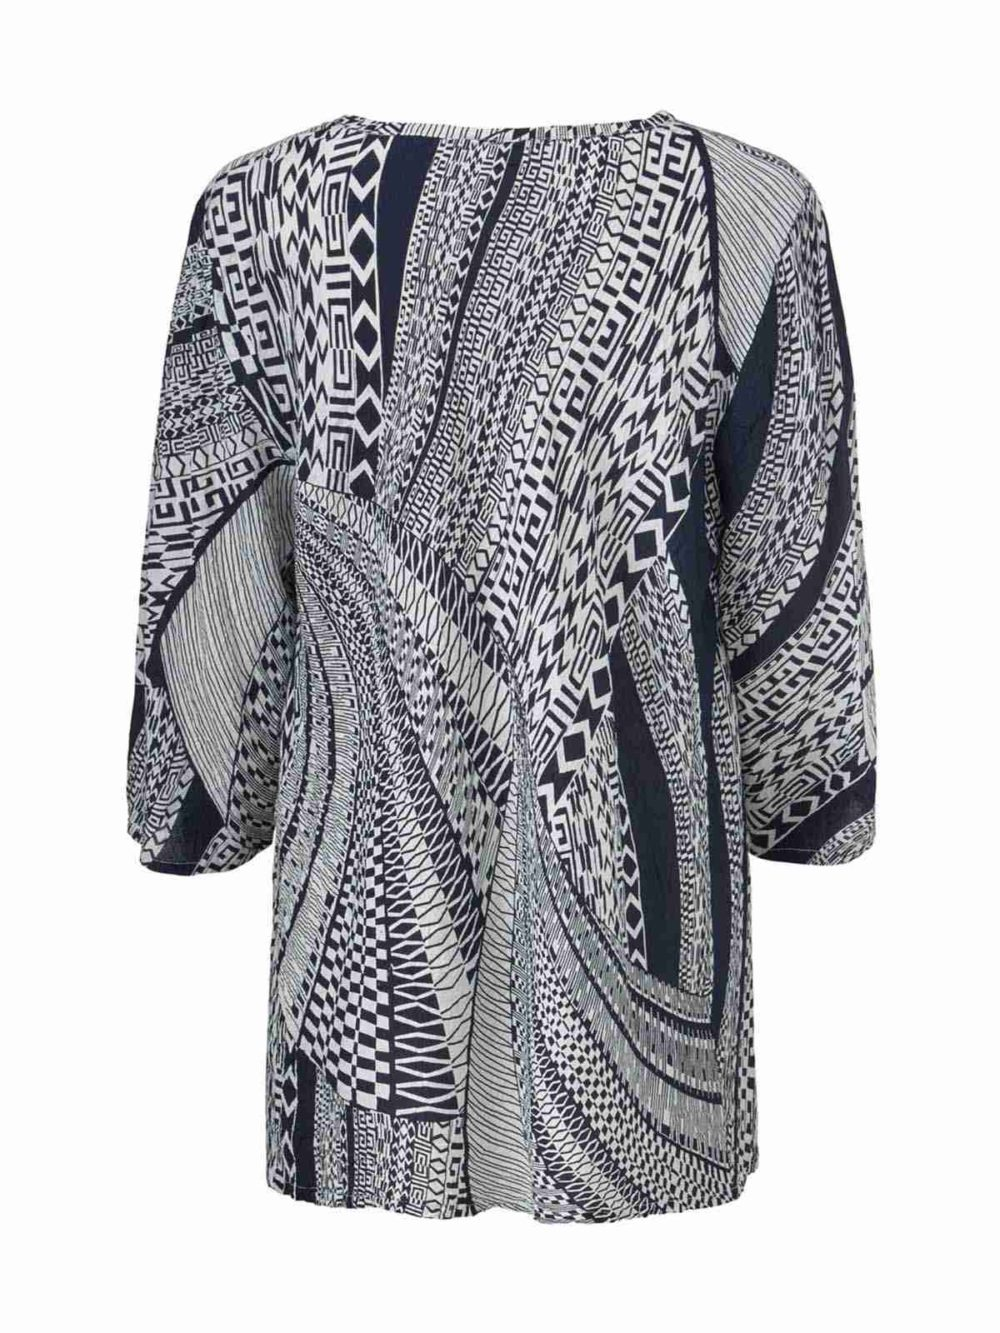 Kata Top Masai Clothing Katie Kerr Women's Clothing